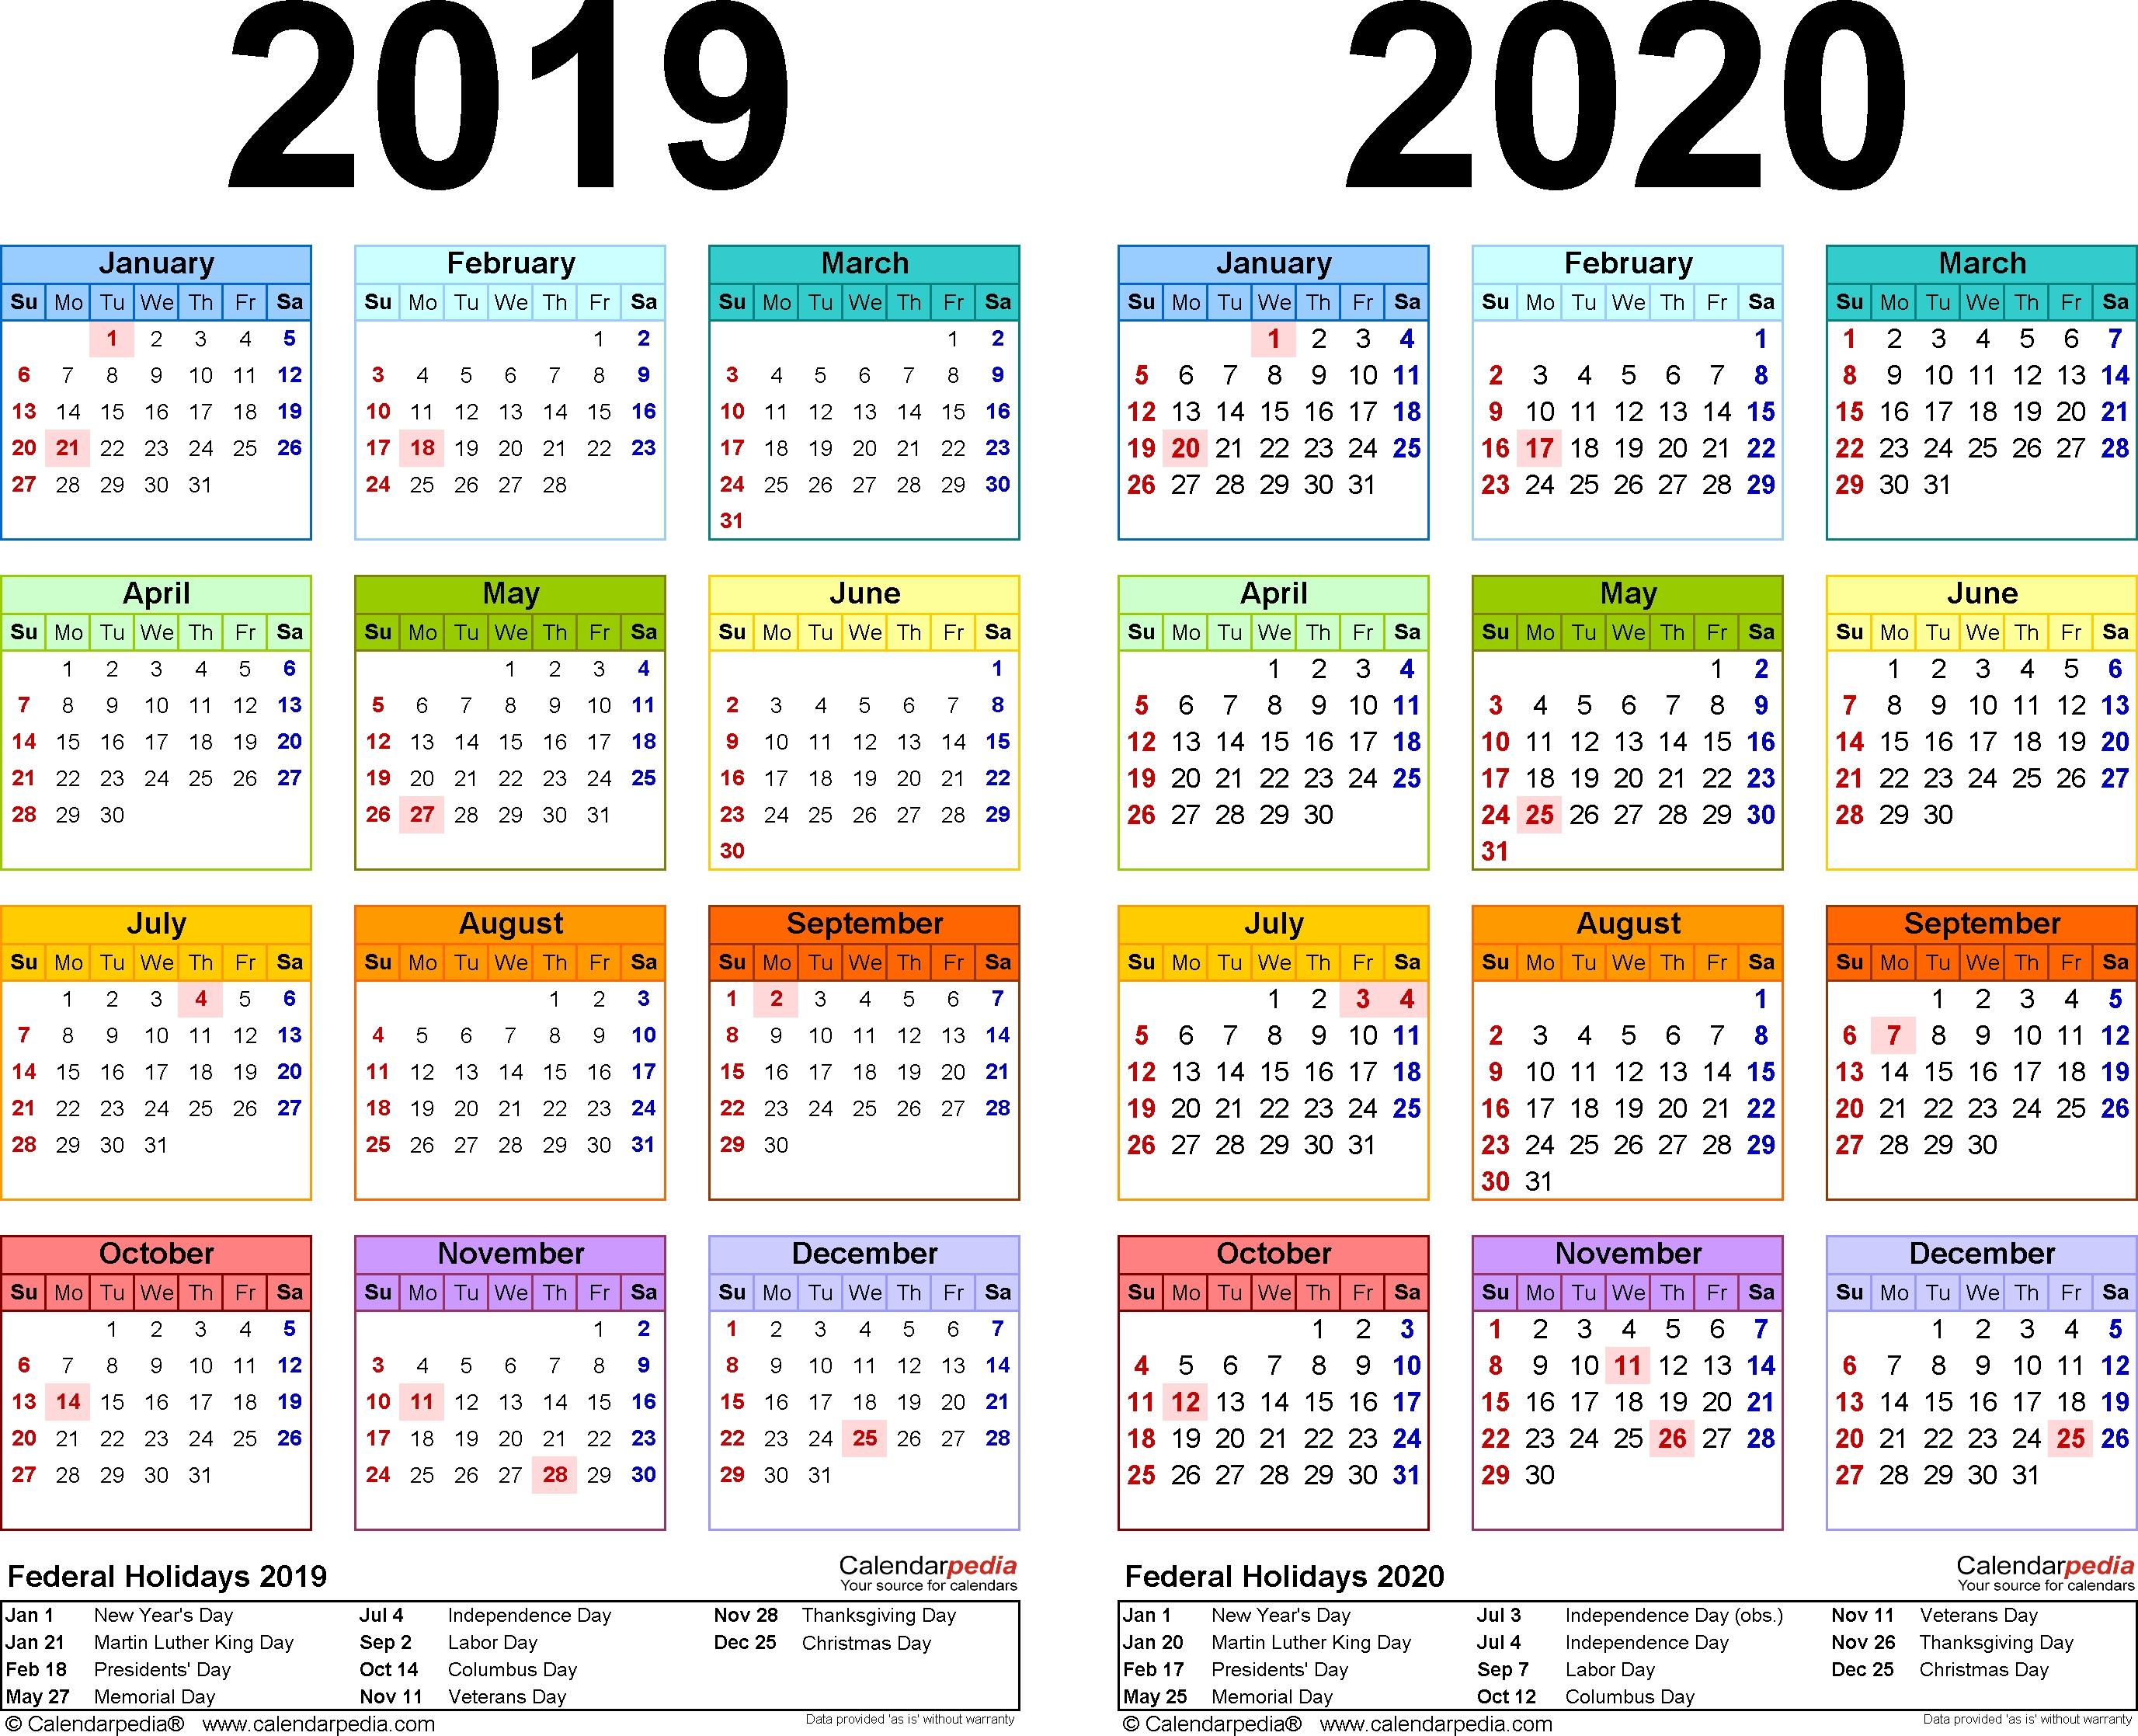 2019-2020 Calendar - Free Printable Two-Year Pdf Calendars 2020 Calendar Of Holidays